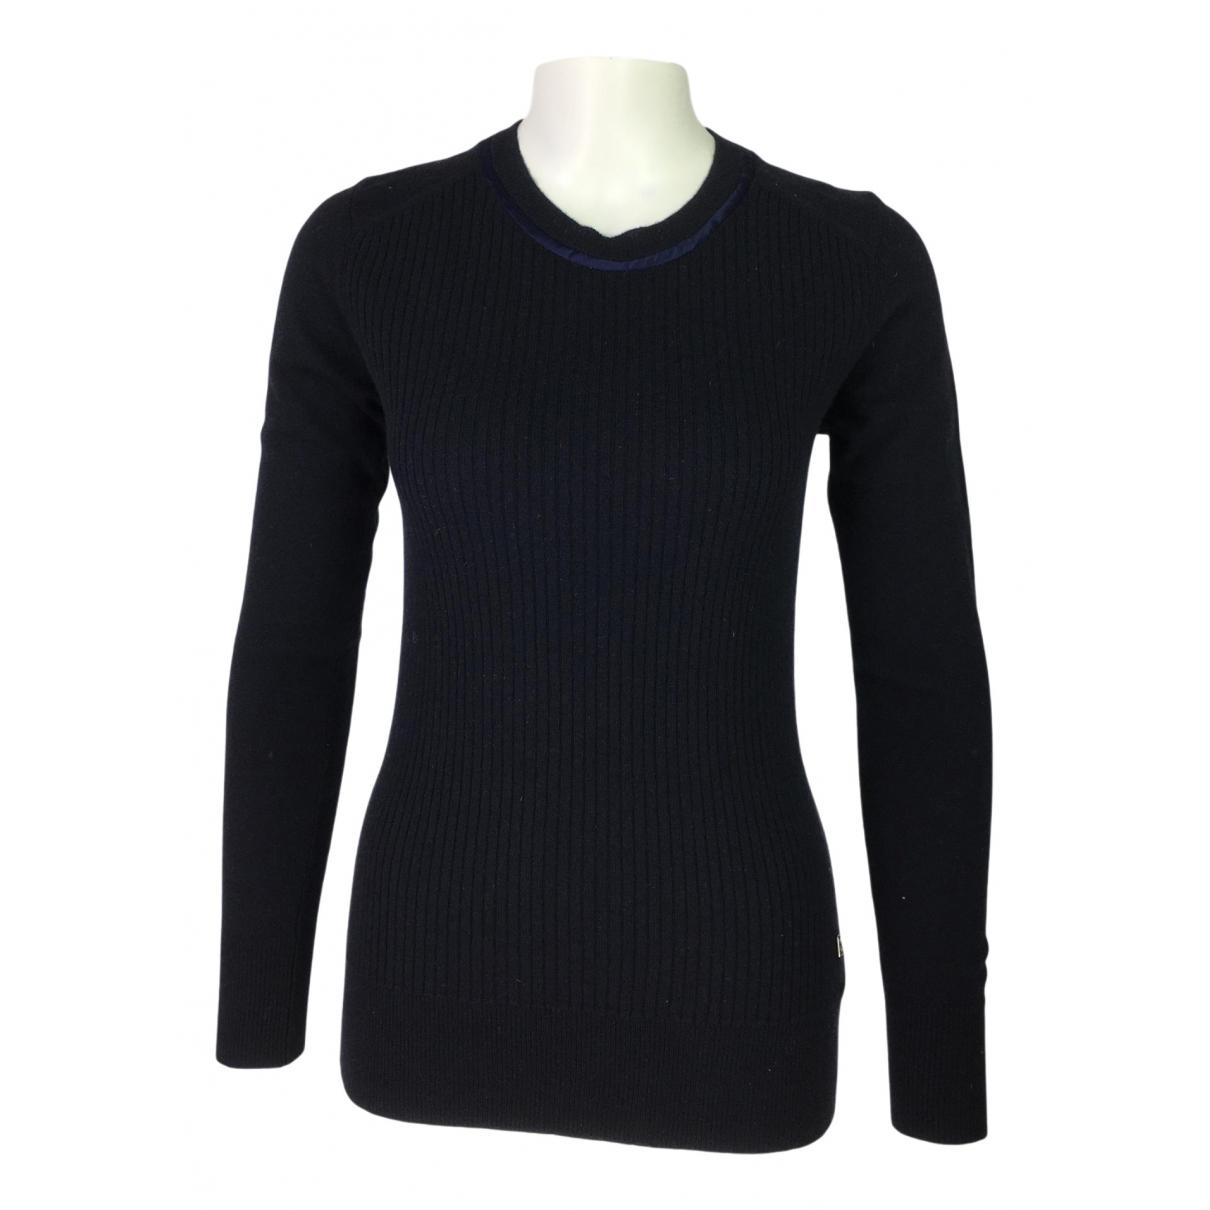 Bogner \N Navy Wool Knitwear for Women M International